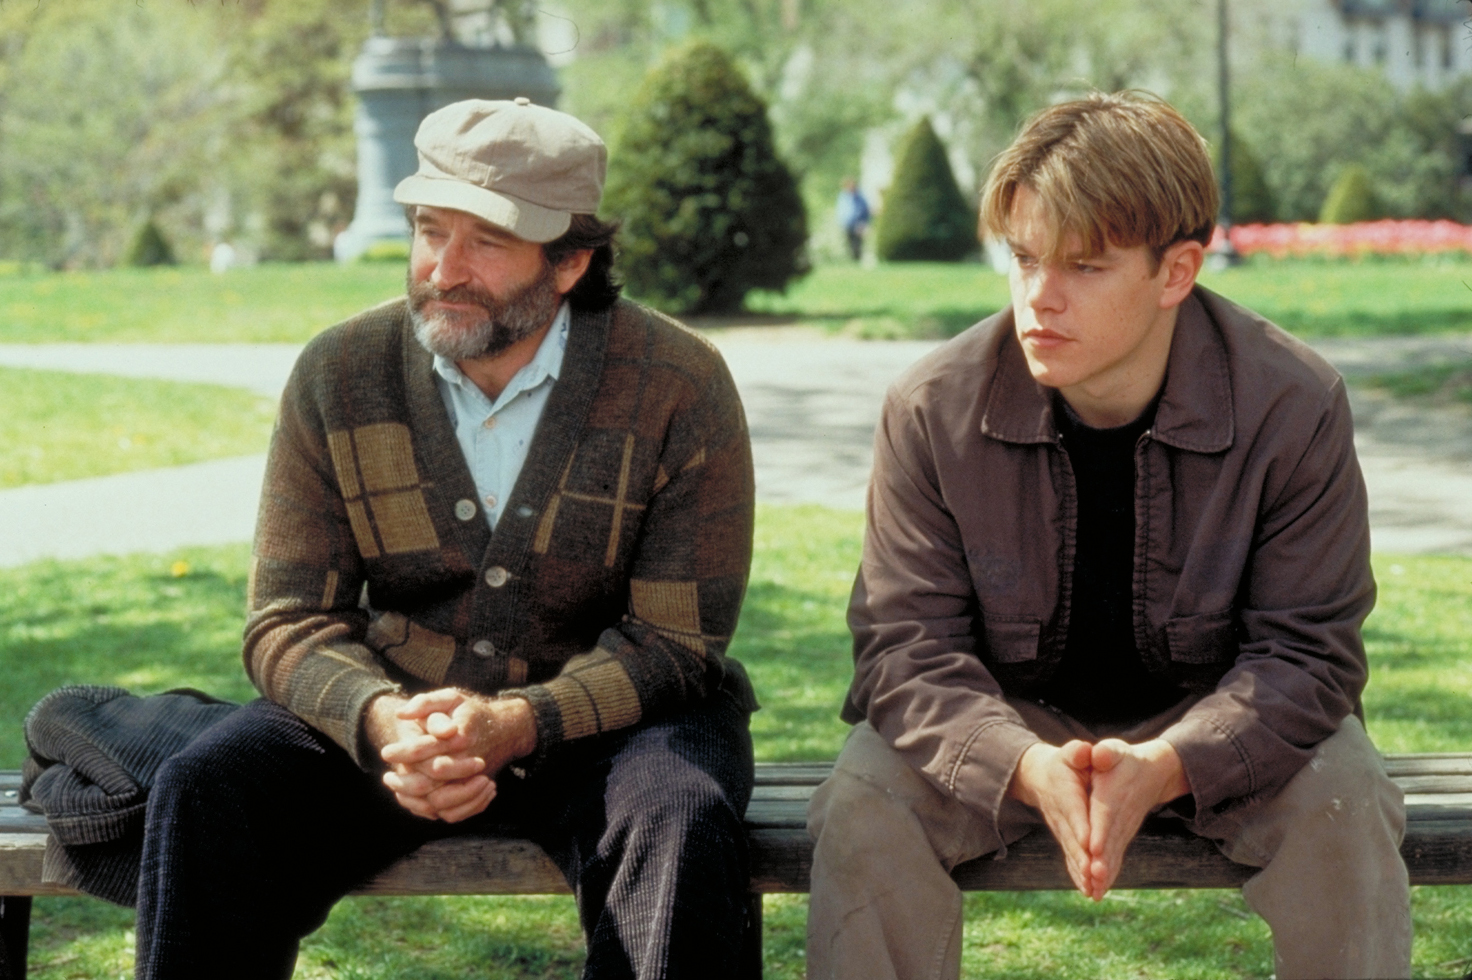 Robin Williams and Matt Damon filming 'Good Will Hunting'.